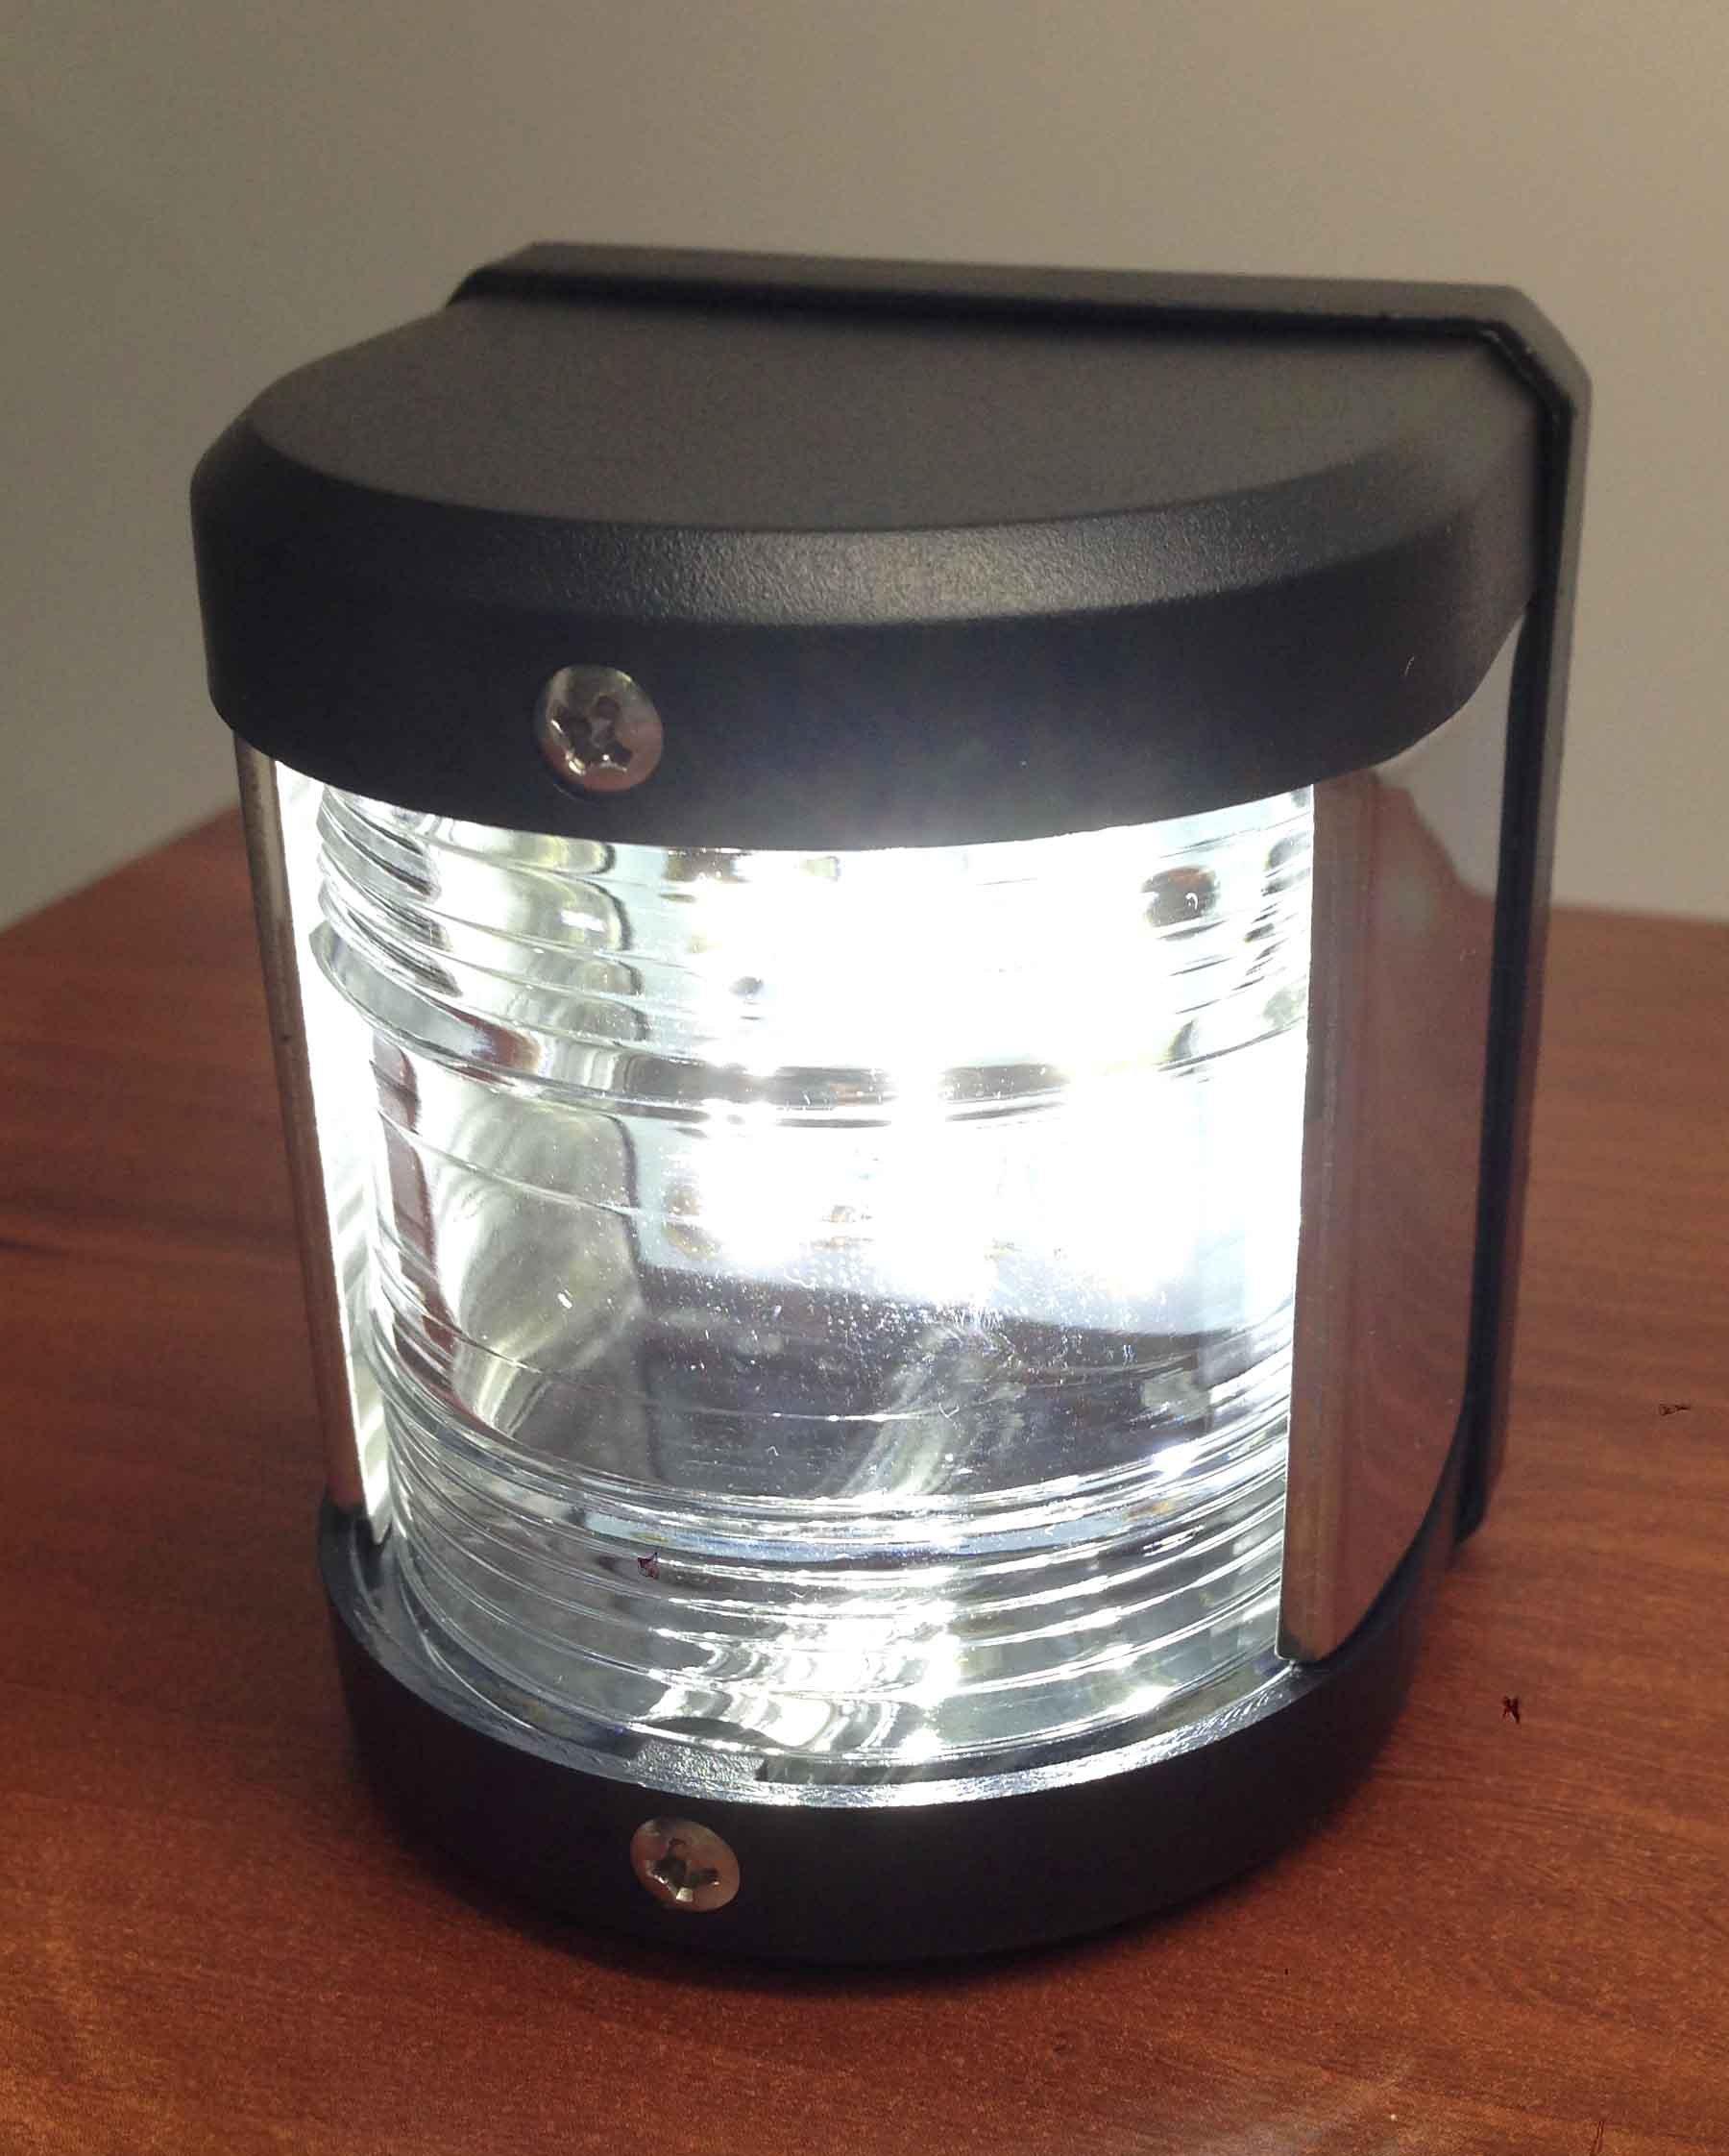 MARINE BOAT WHITE STERN LED NAVIGATION LIGHT WATERPROOF 2 NAUTICAL MILES